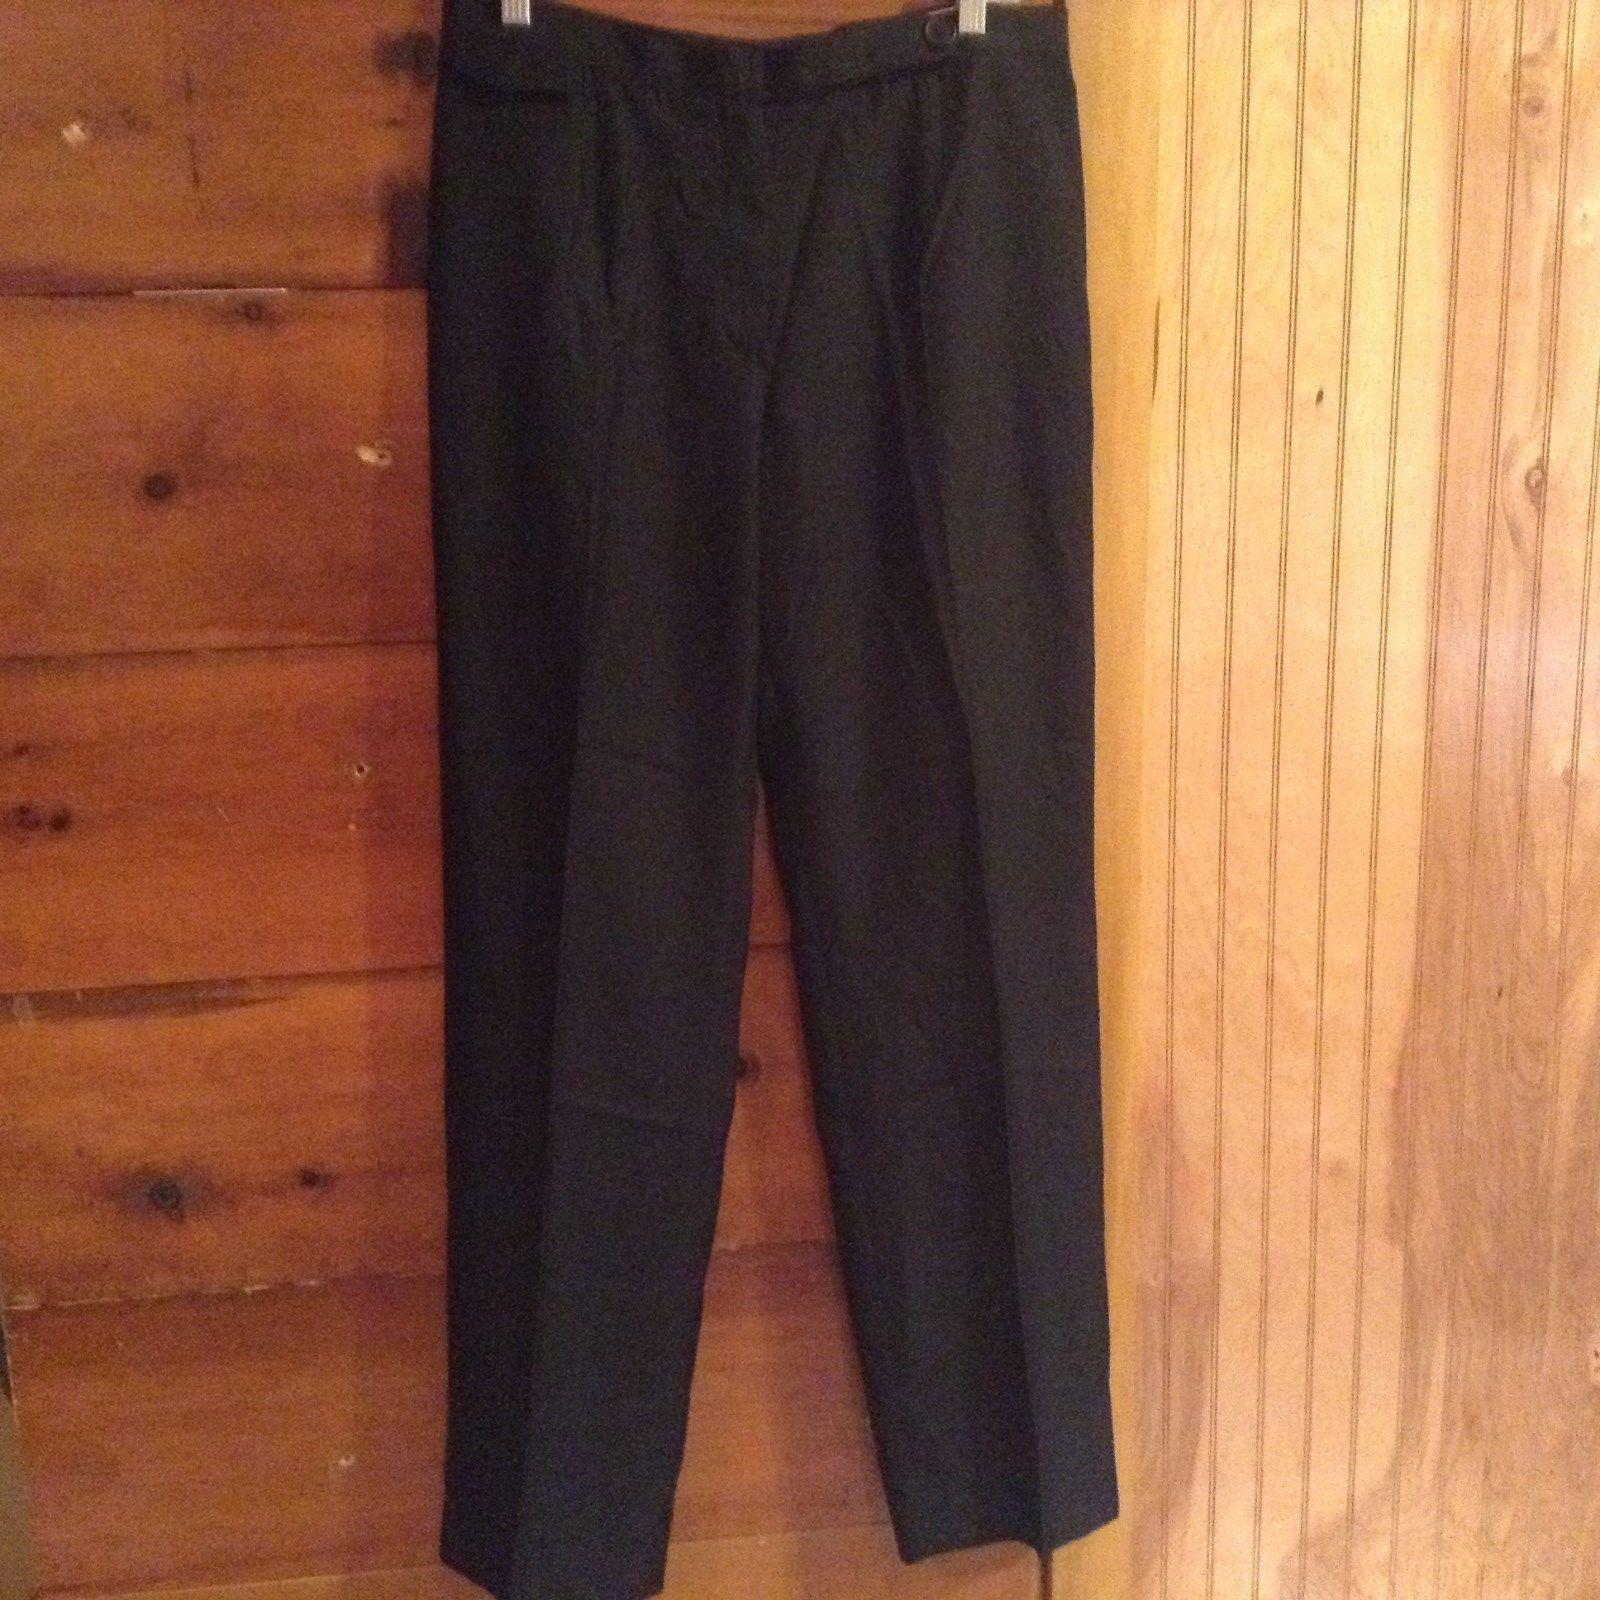 Bernard Zins Saks 5th Avenue Collection Black Dress Pants 100 Percent Silk